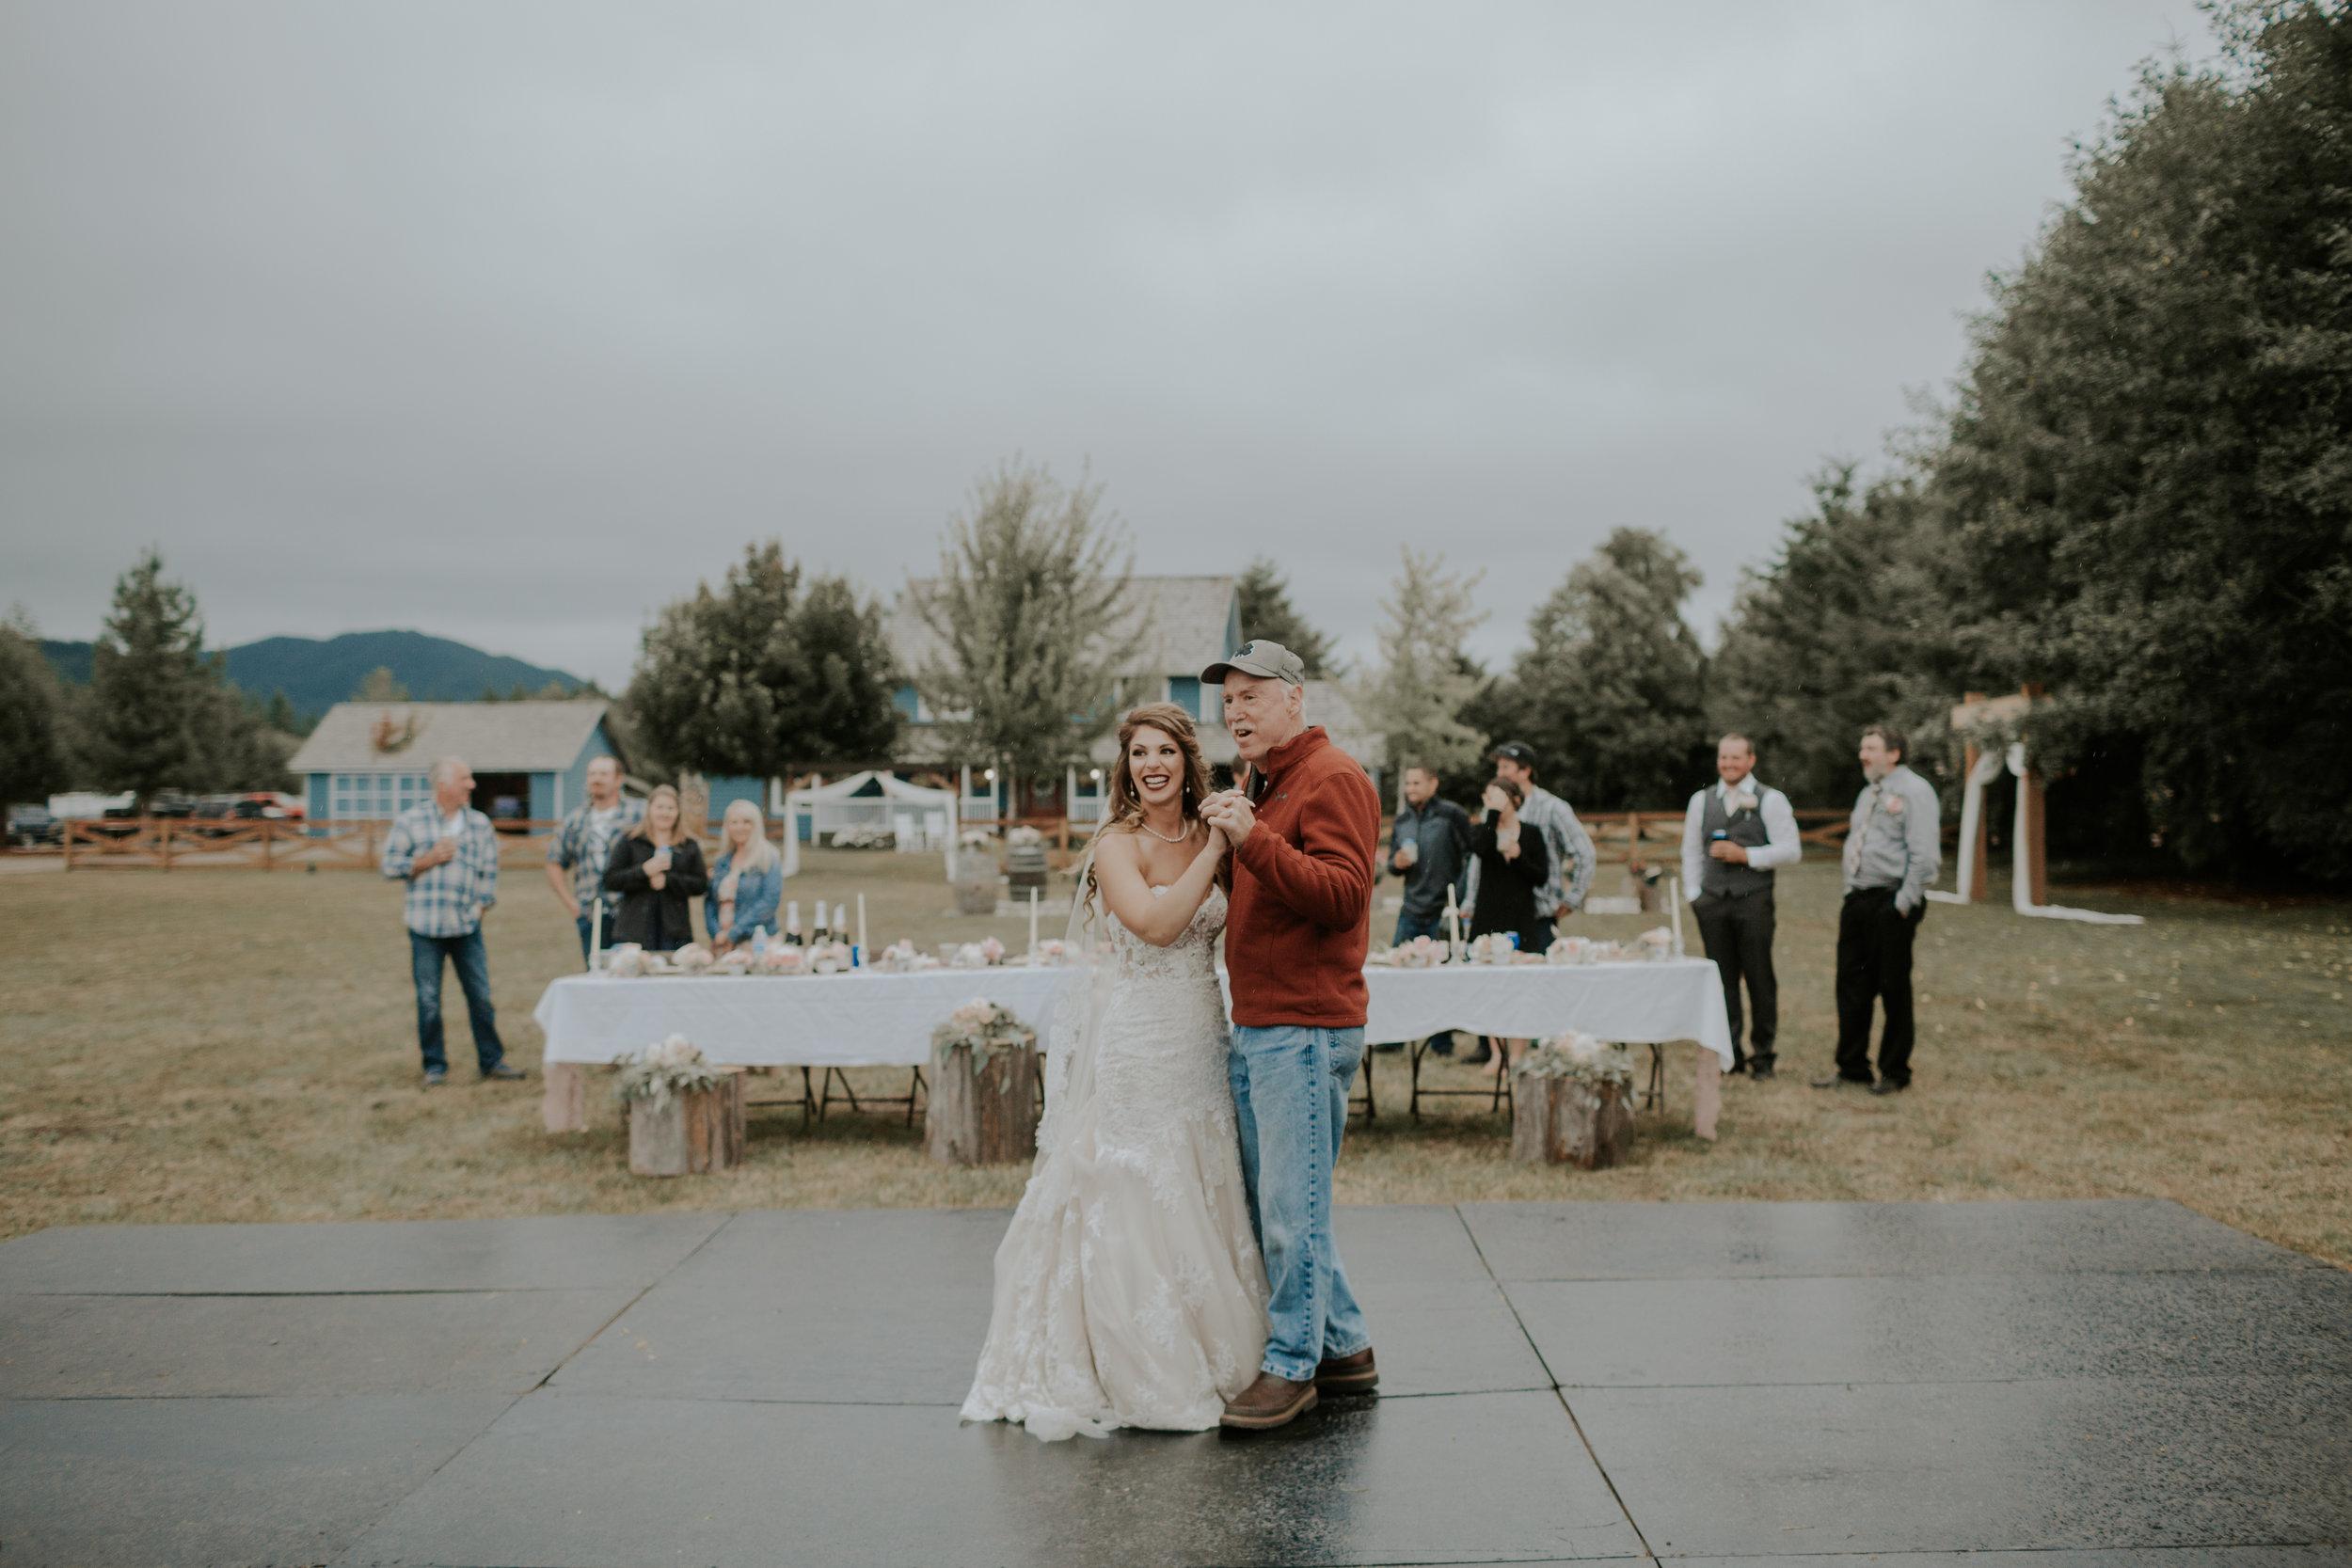 Olympic-Peninsula-Wedding-Photographer-PNW-Forks-Port-Angeles-Kayla-Dawn-Photography-engagement-Olympic-National-Park-187.jpg